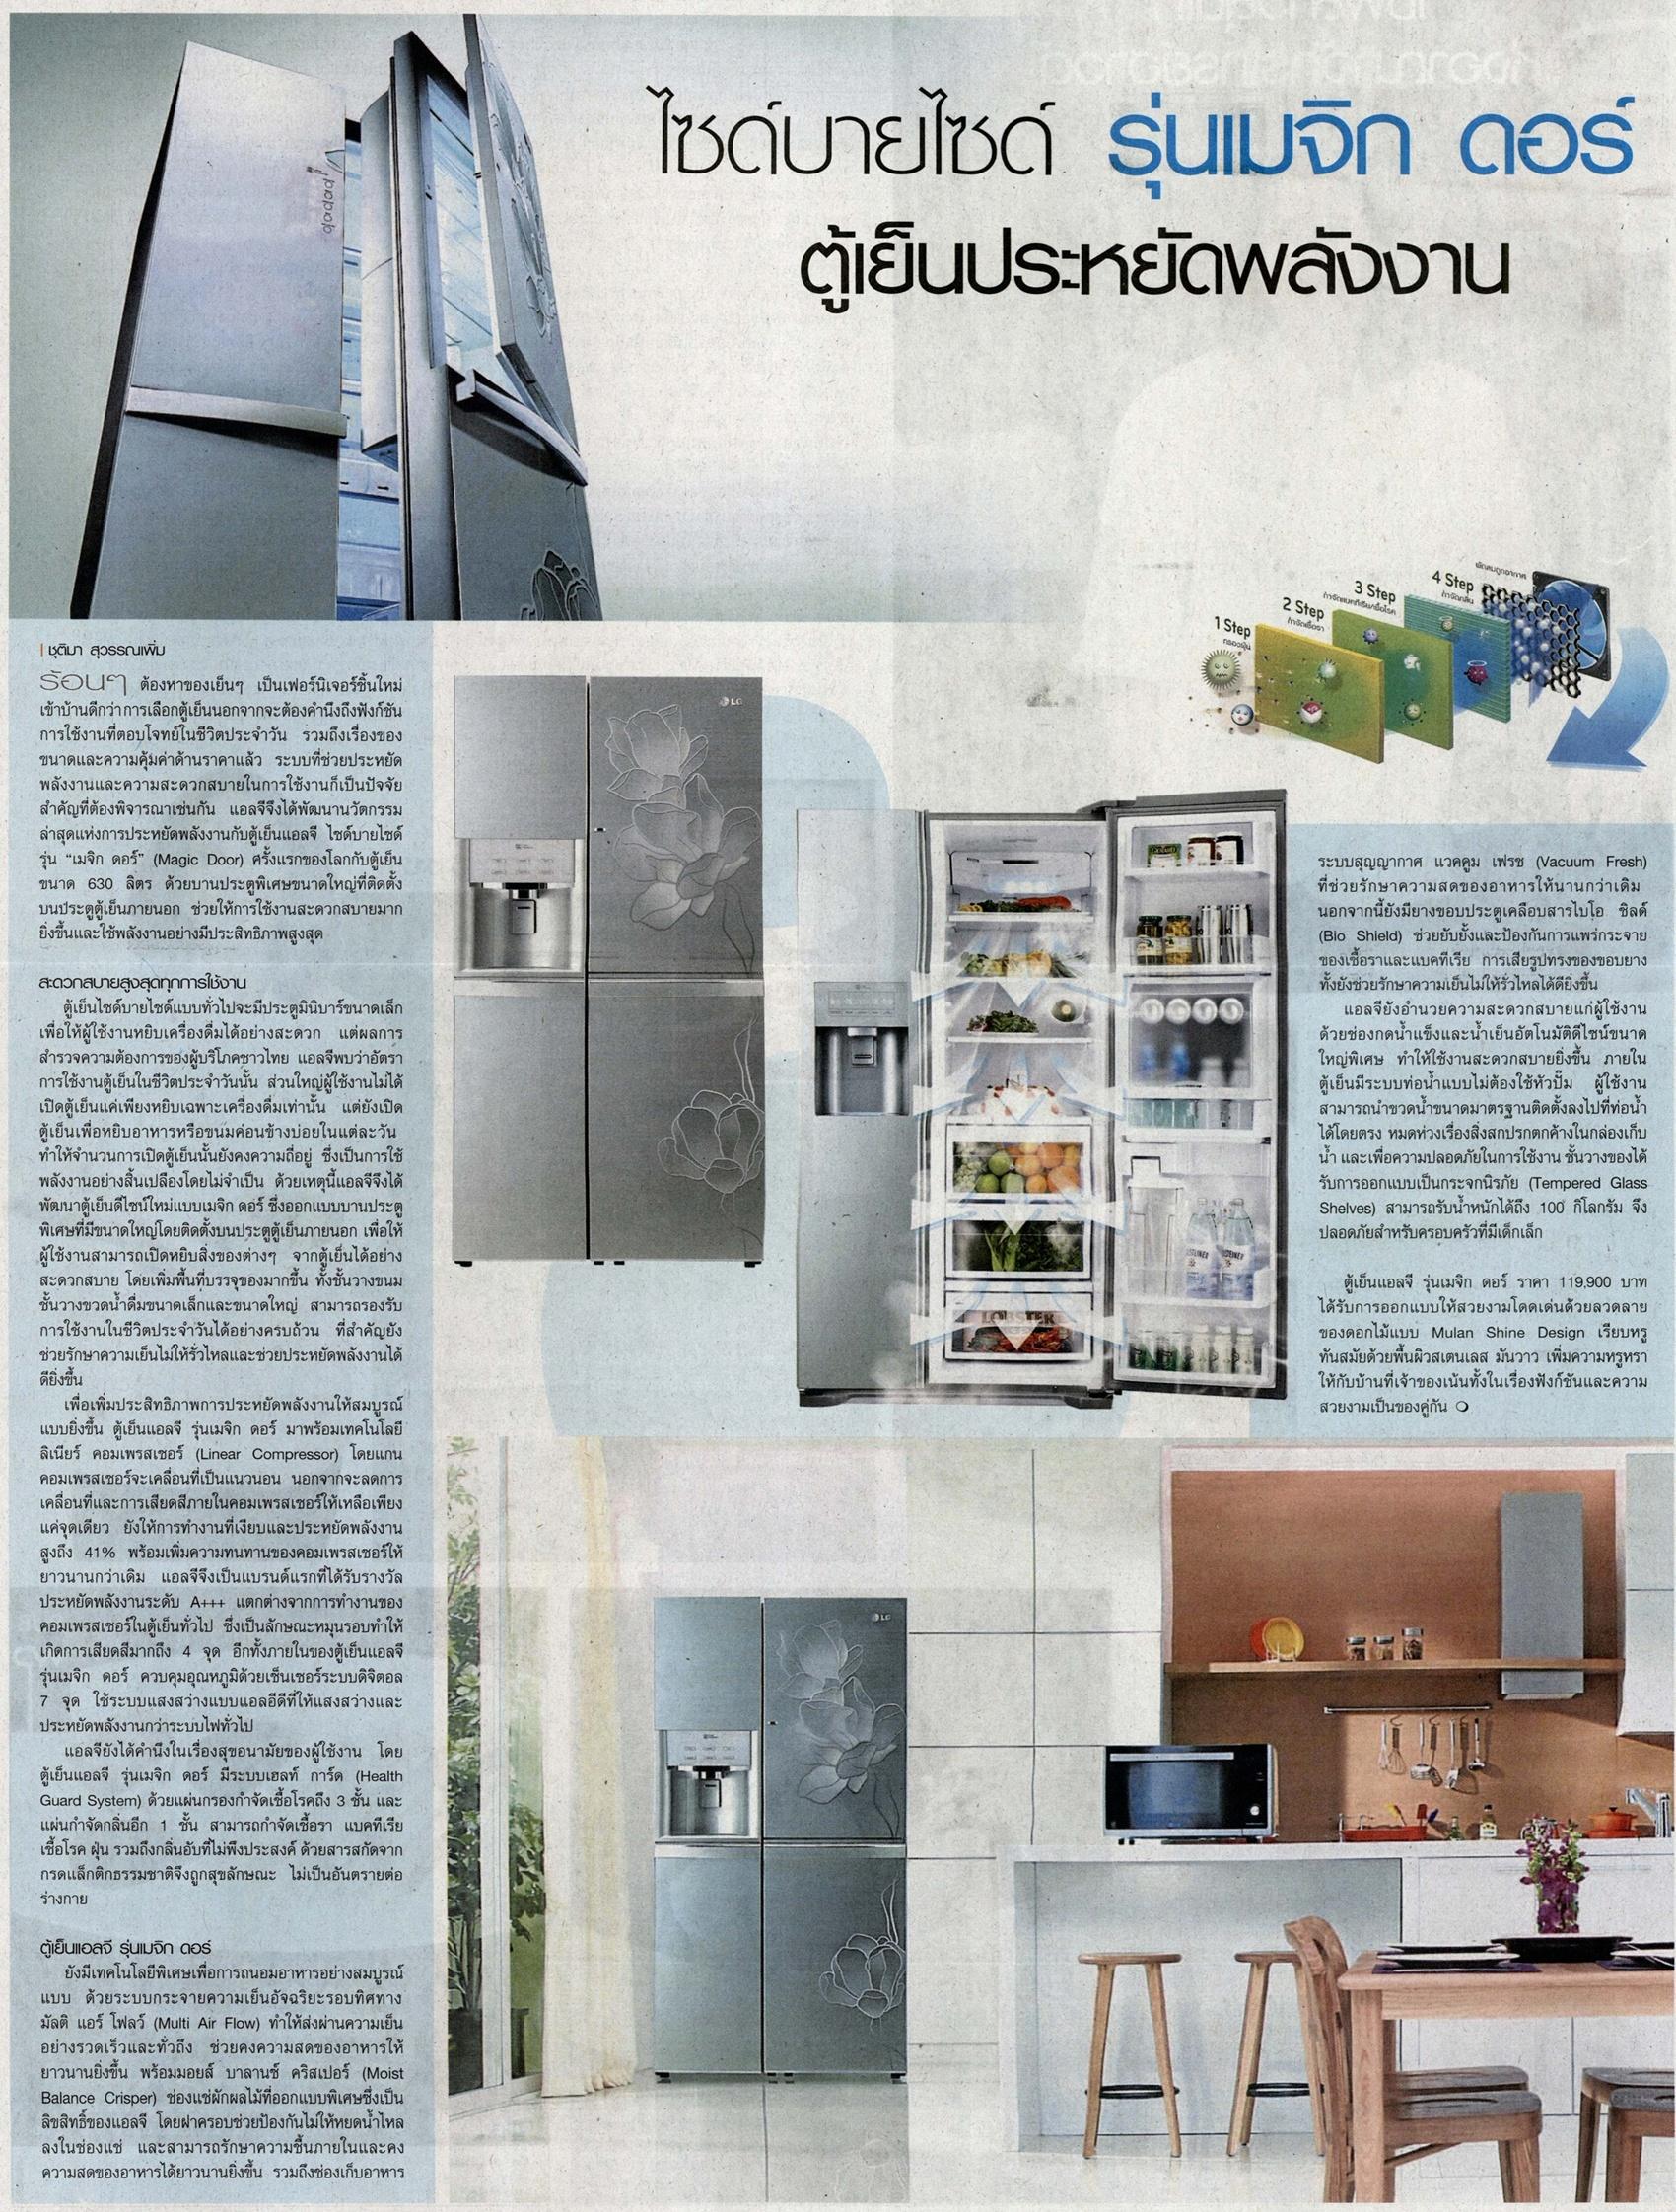 Post Today อยากบอก ตู้เย็น-SIDE-BY-SIDE รุ่น Magic door ตู้เย็นประหยัดพลังงาน